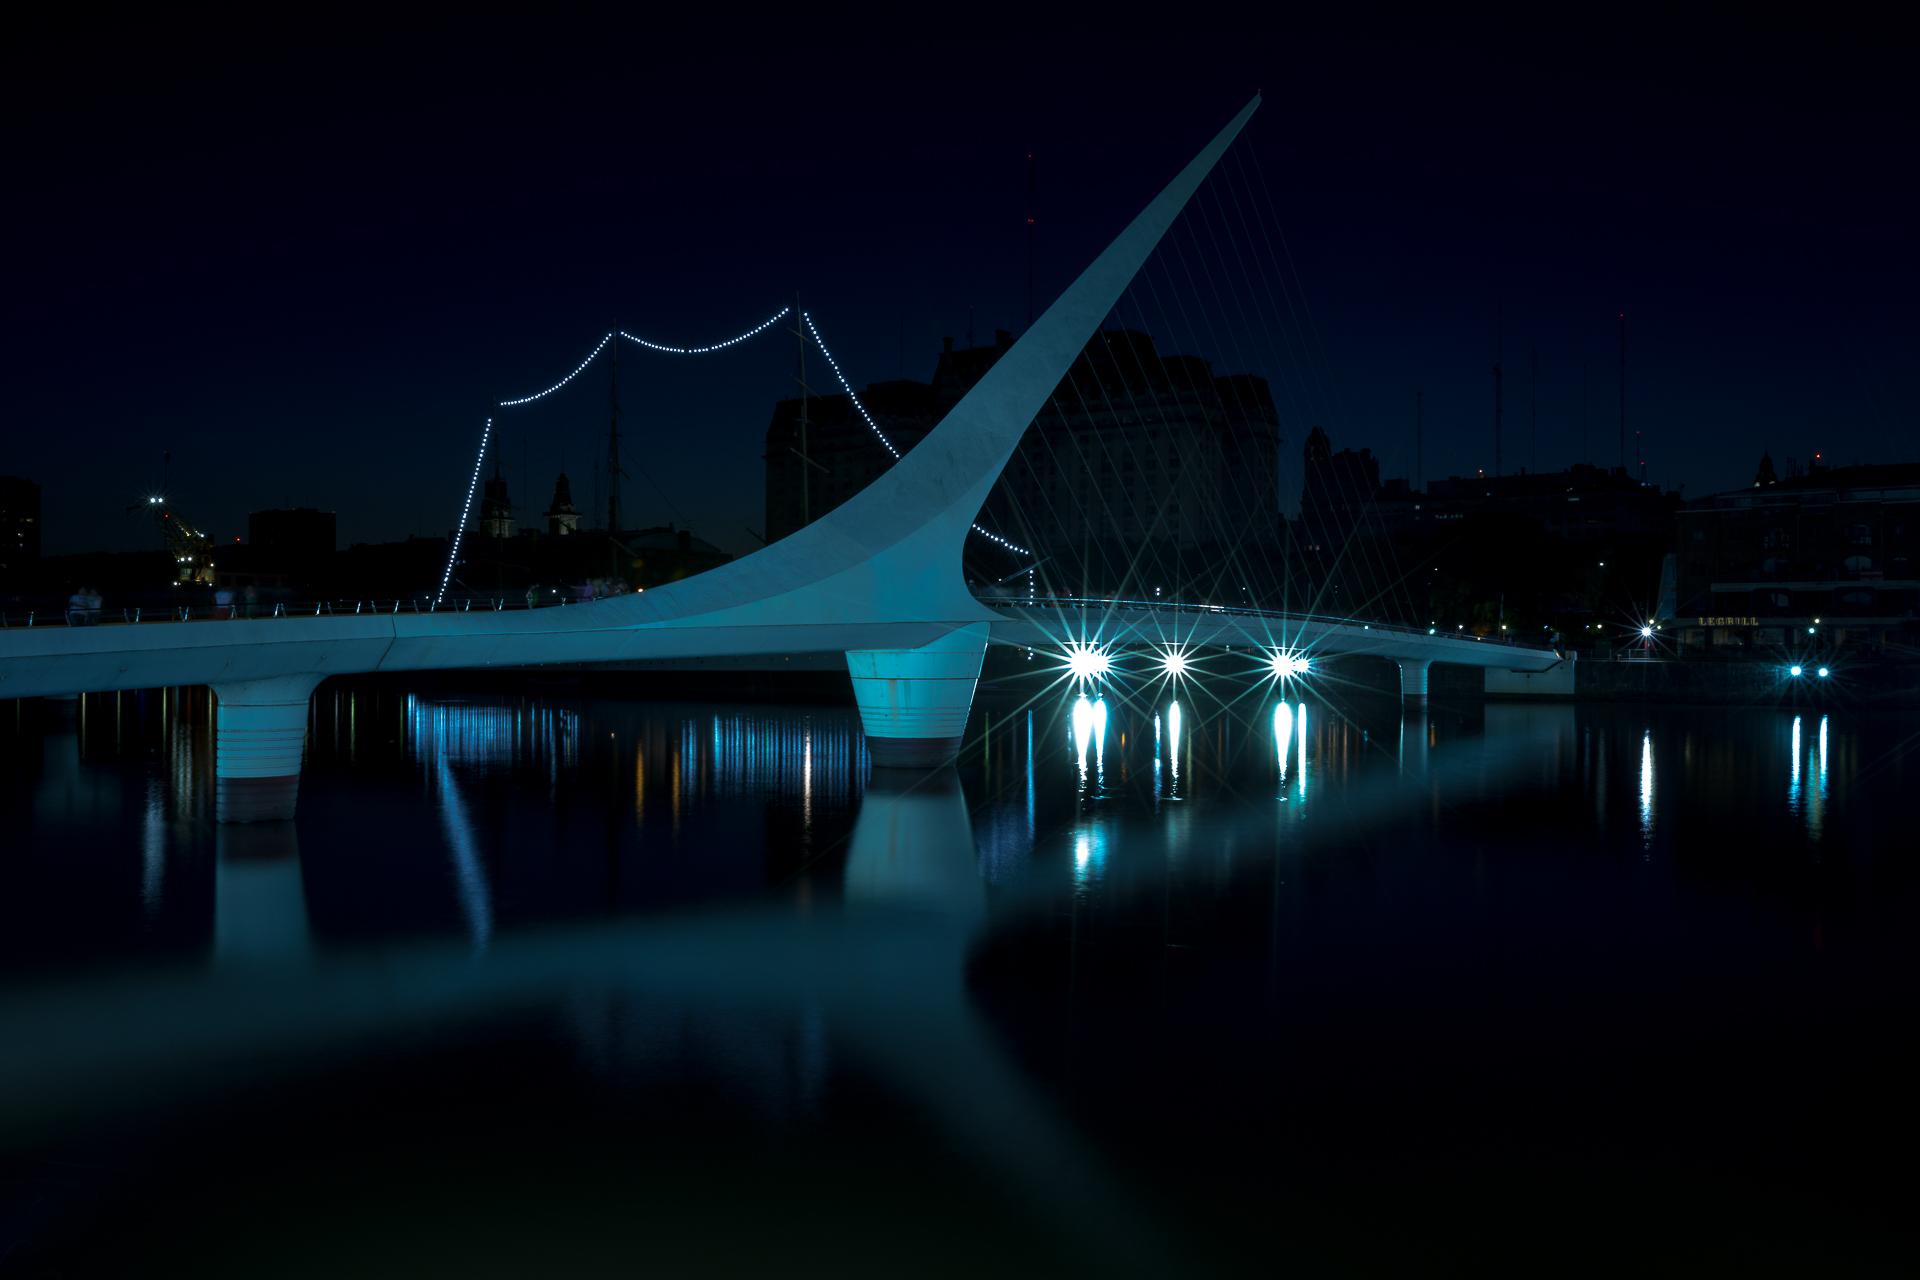 Free Images Light Bridge Skyline Night City Atmosphere Photo